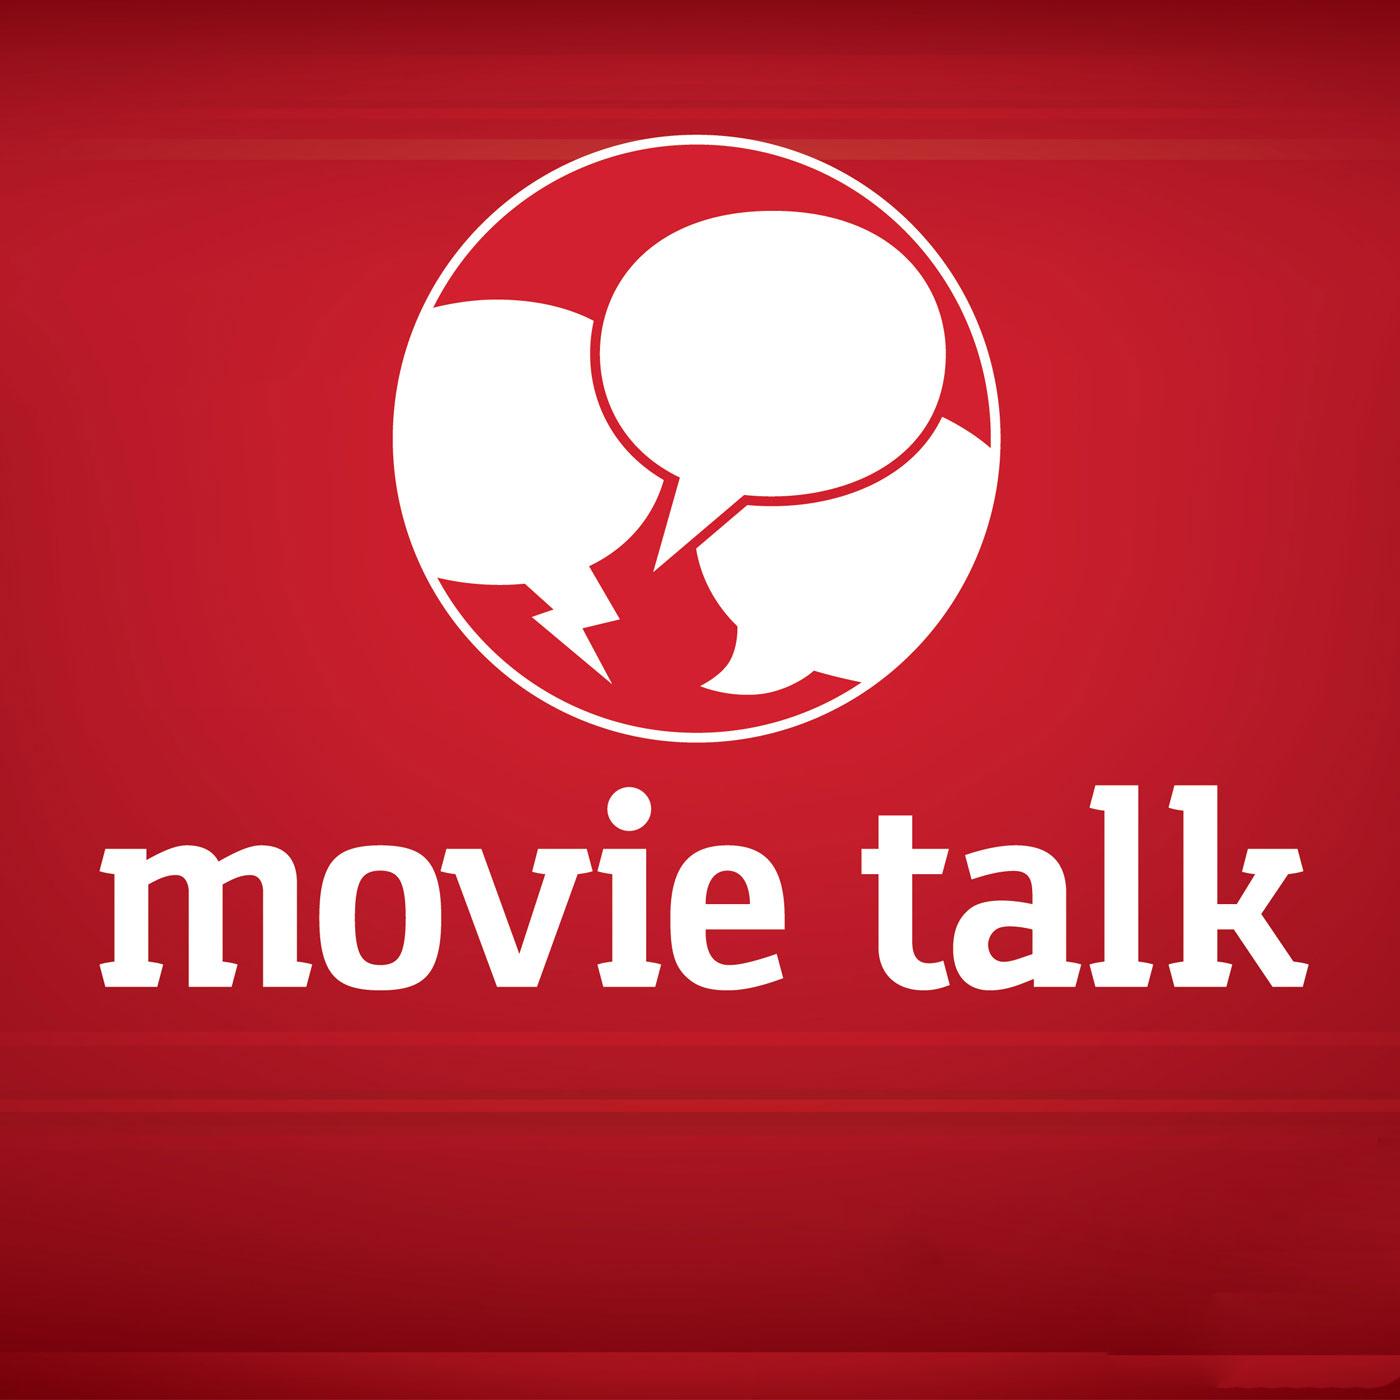 AMC Movie Talk - Simon Pegg Says Original STAR TREK 3 Script Was Too Star Trek-y For Studio